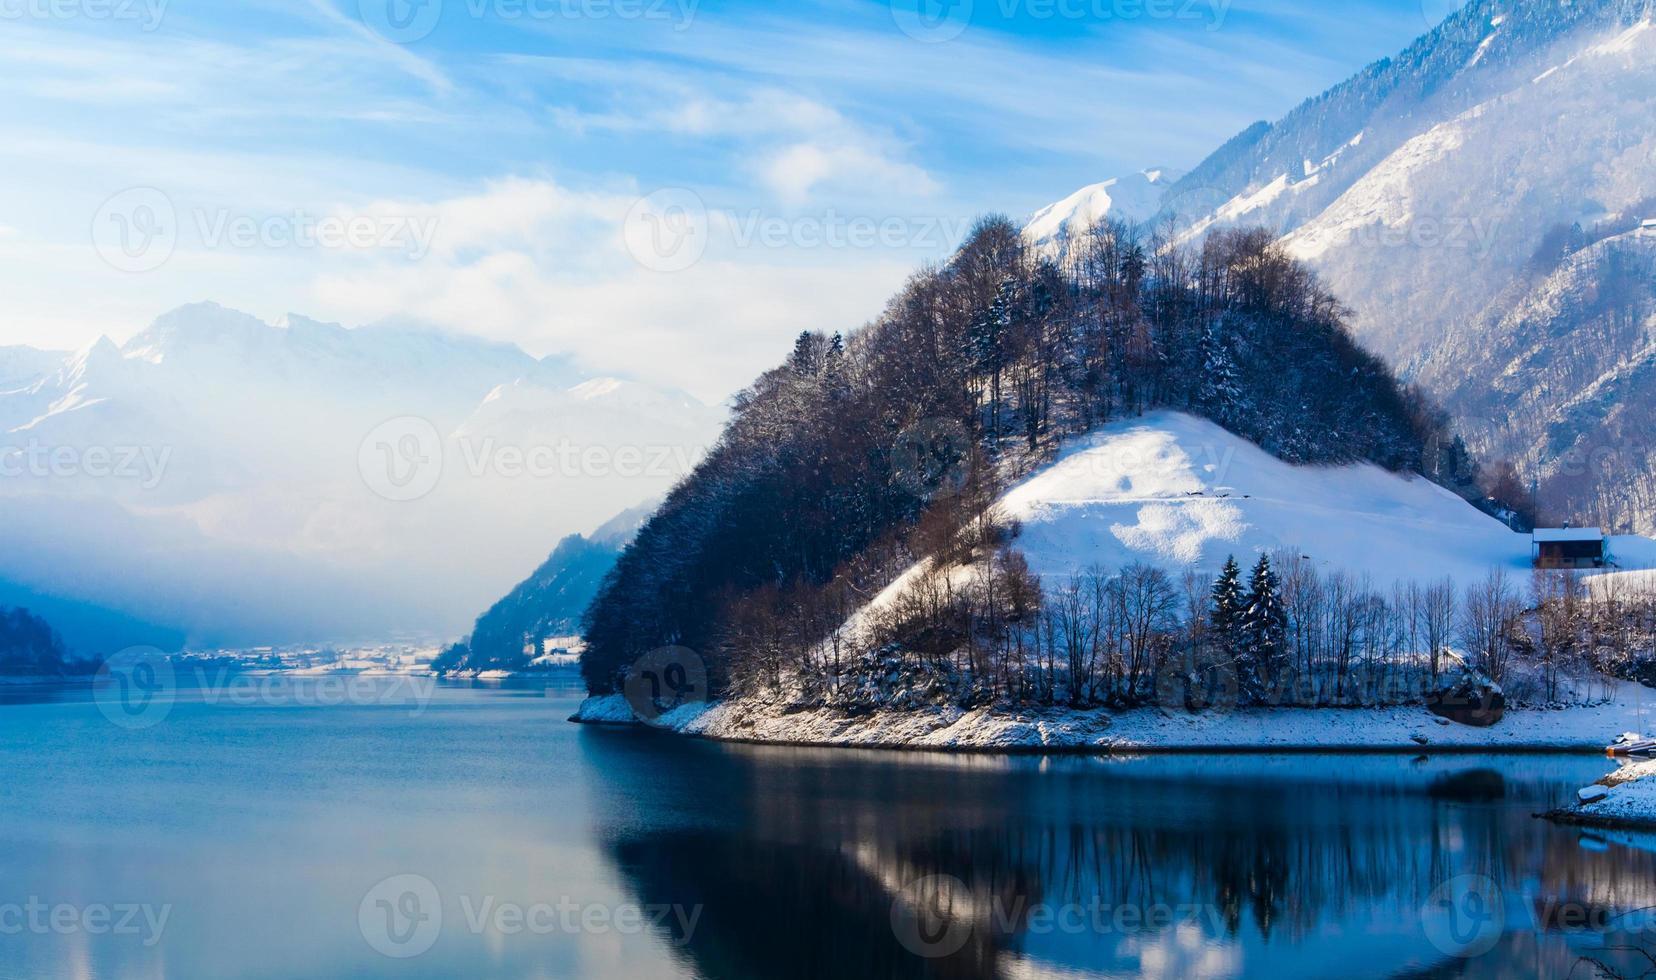 vintern i schweiziska alperna. foto